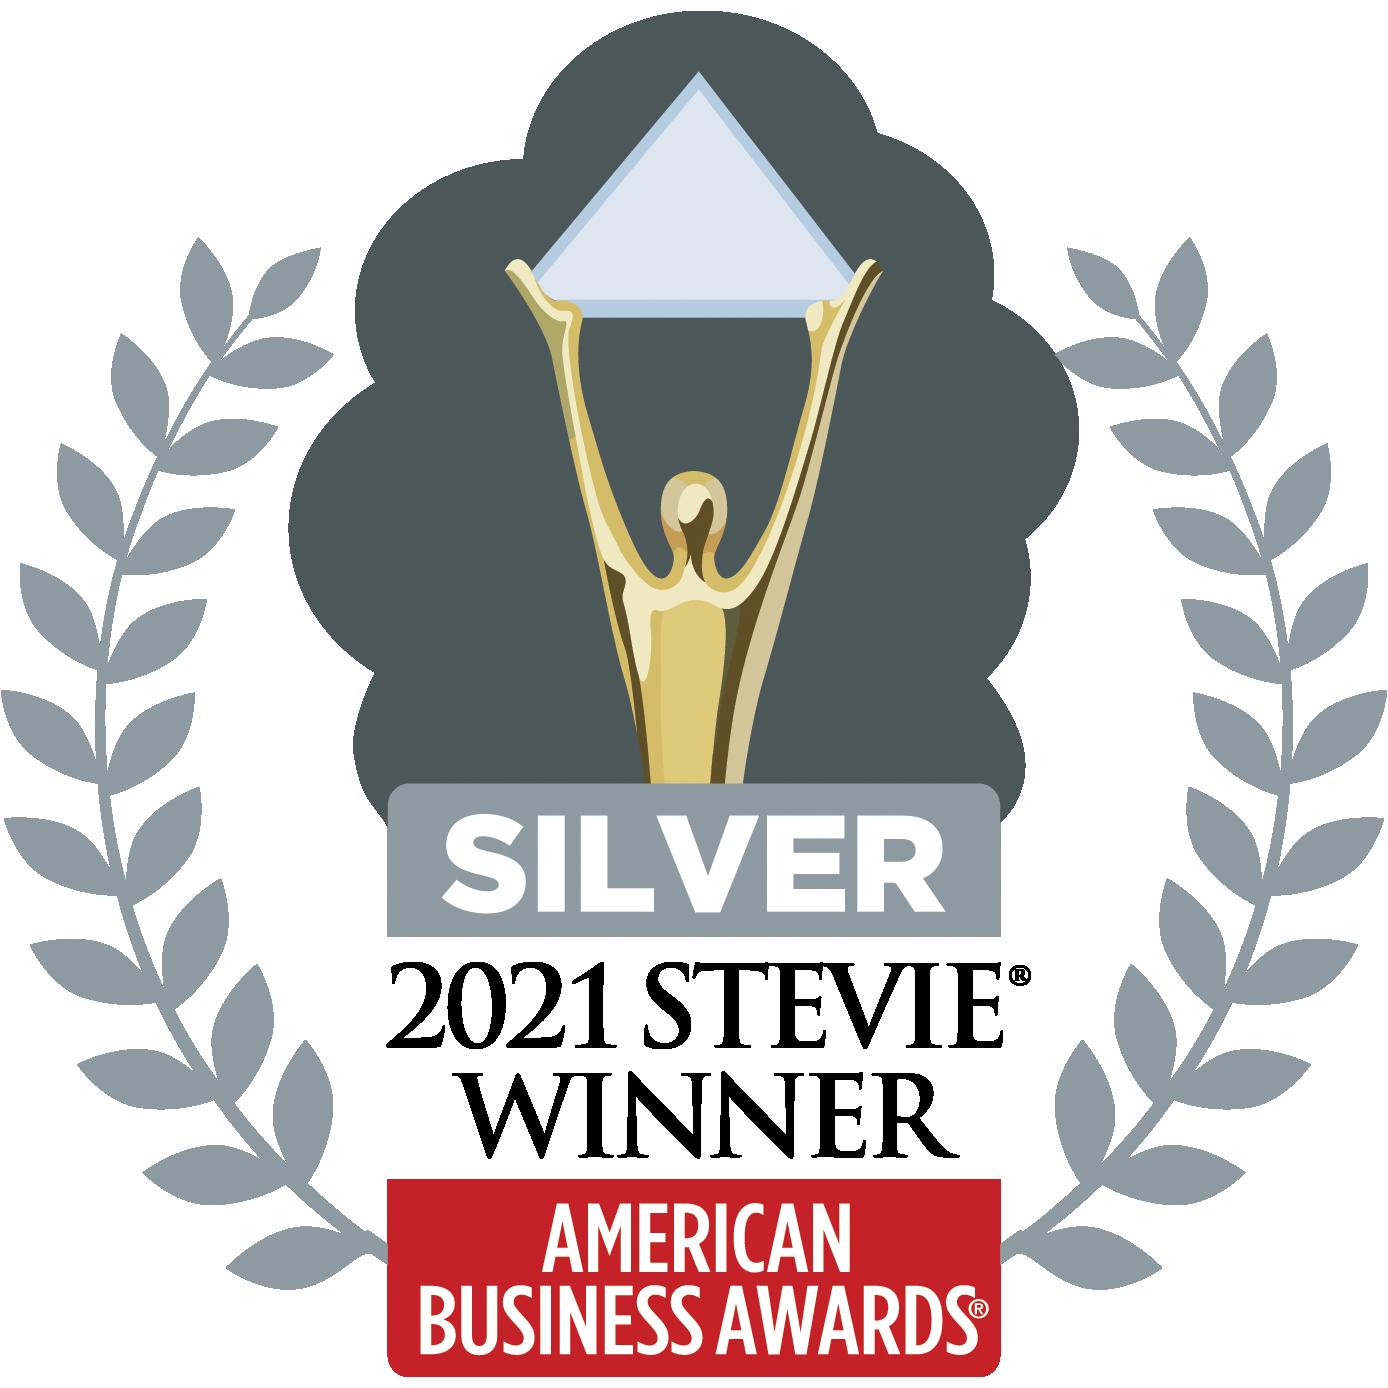 Callzilla won the Silver Stevie® Award in American Business Awards®